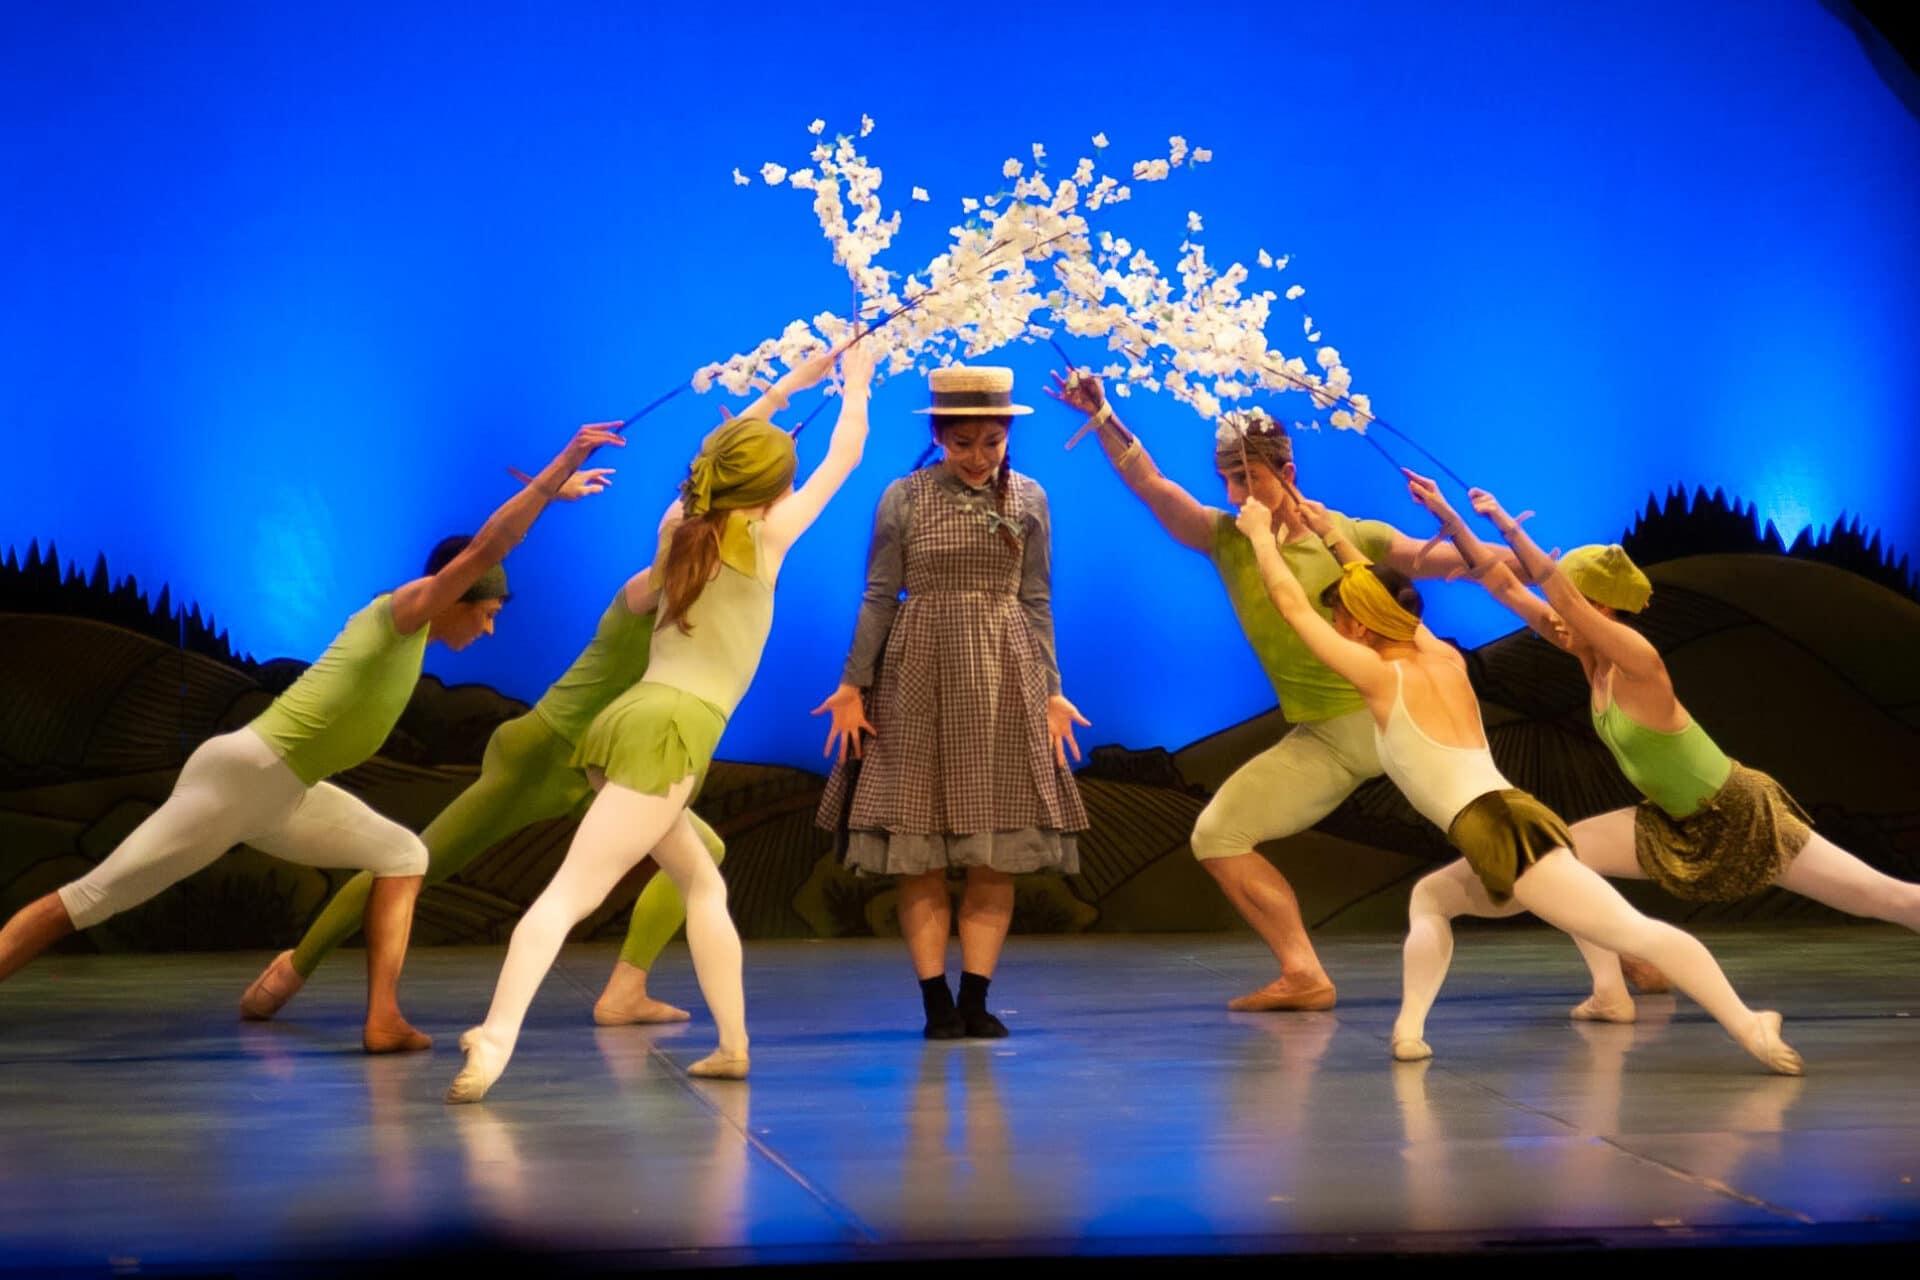 Anne of Green Gables – The Ballet